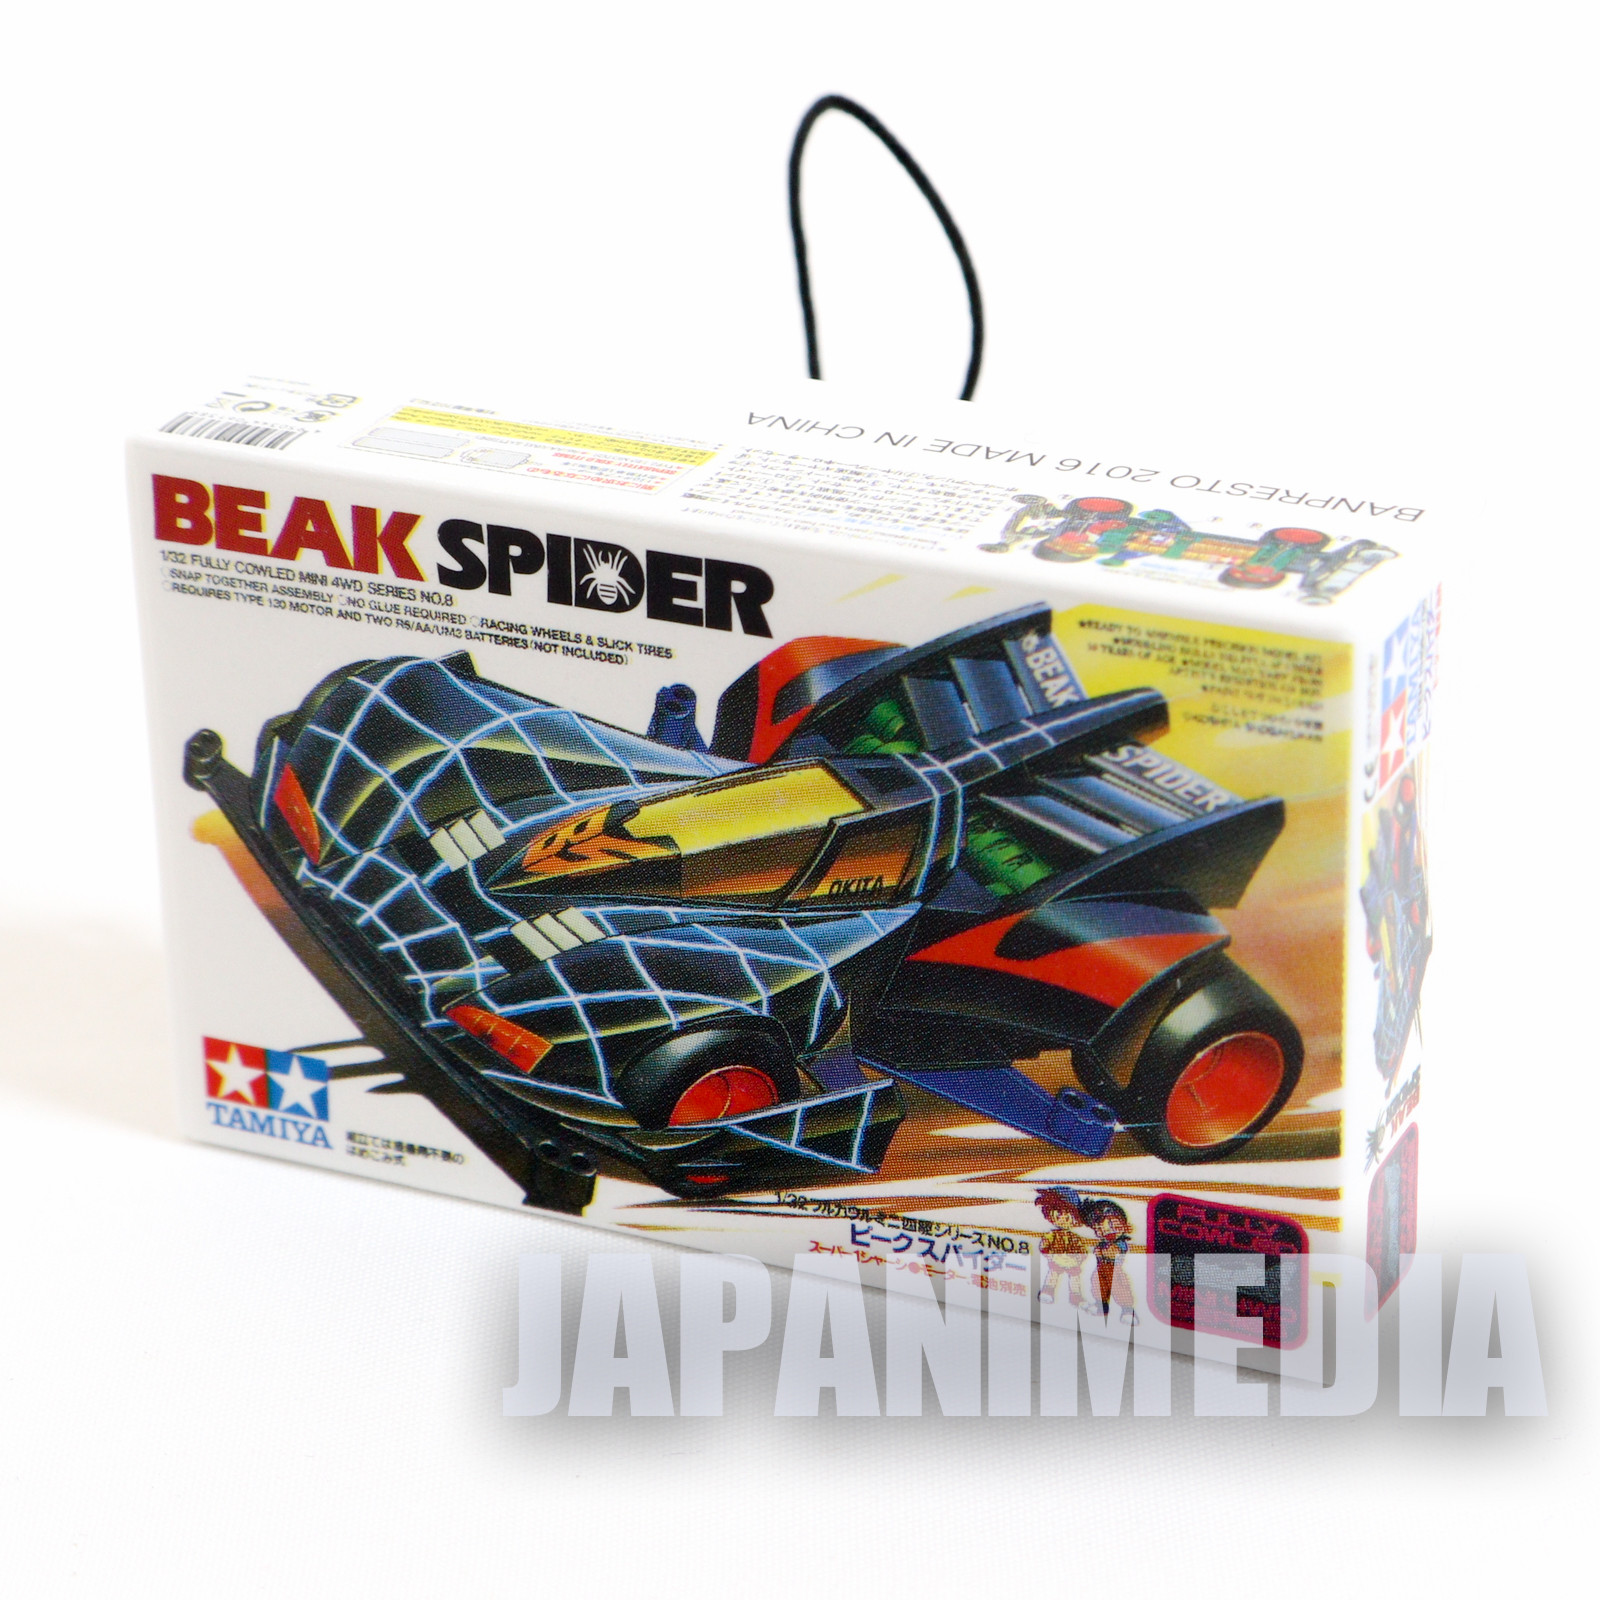 Bakusou Kyoudai Let's & Go!! Small Case Strap Mini 4WD Beak Spider TAMIYA